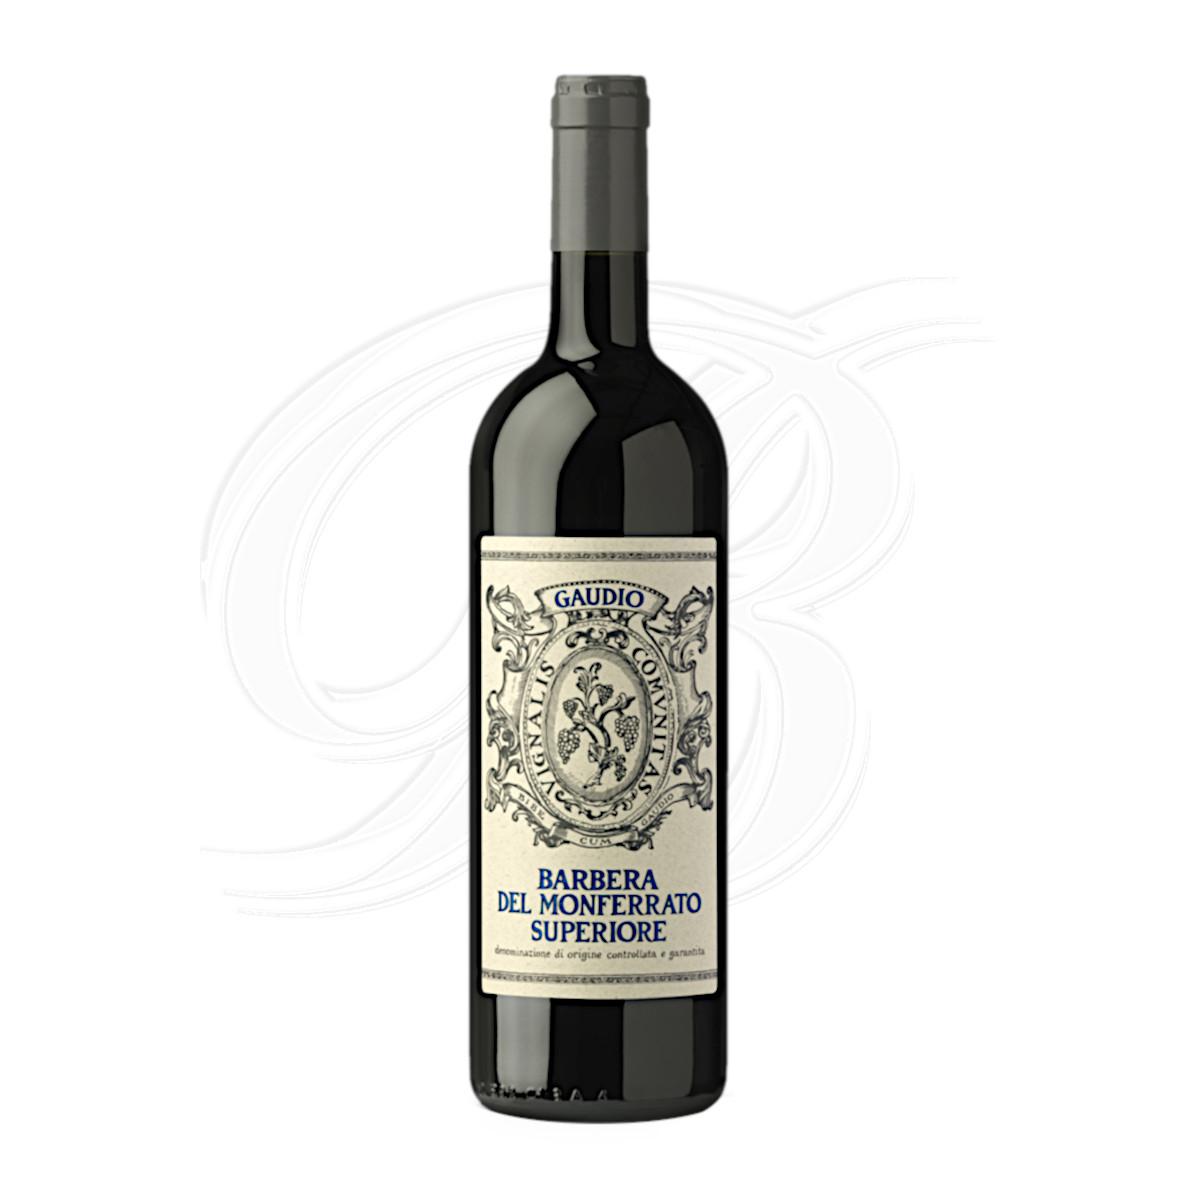 Barbera Superiore vom Weingut Gaudio